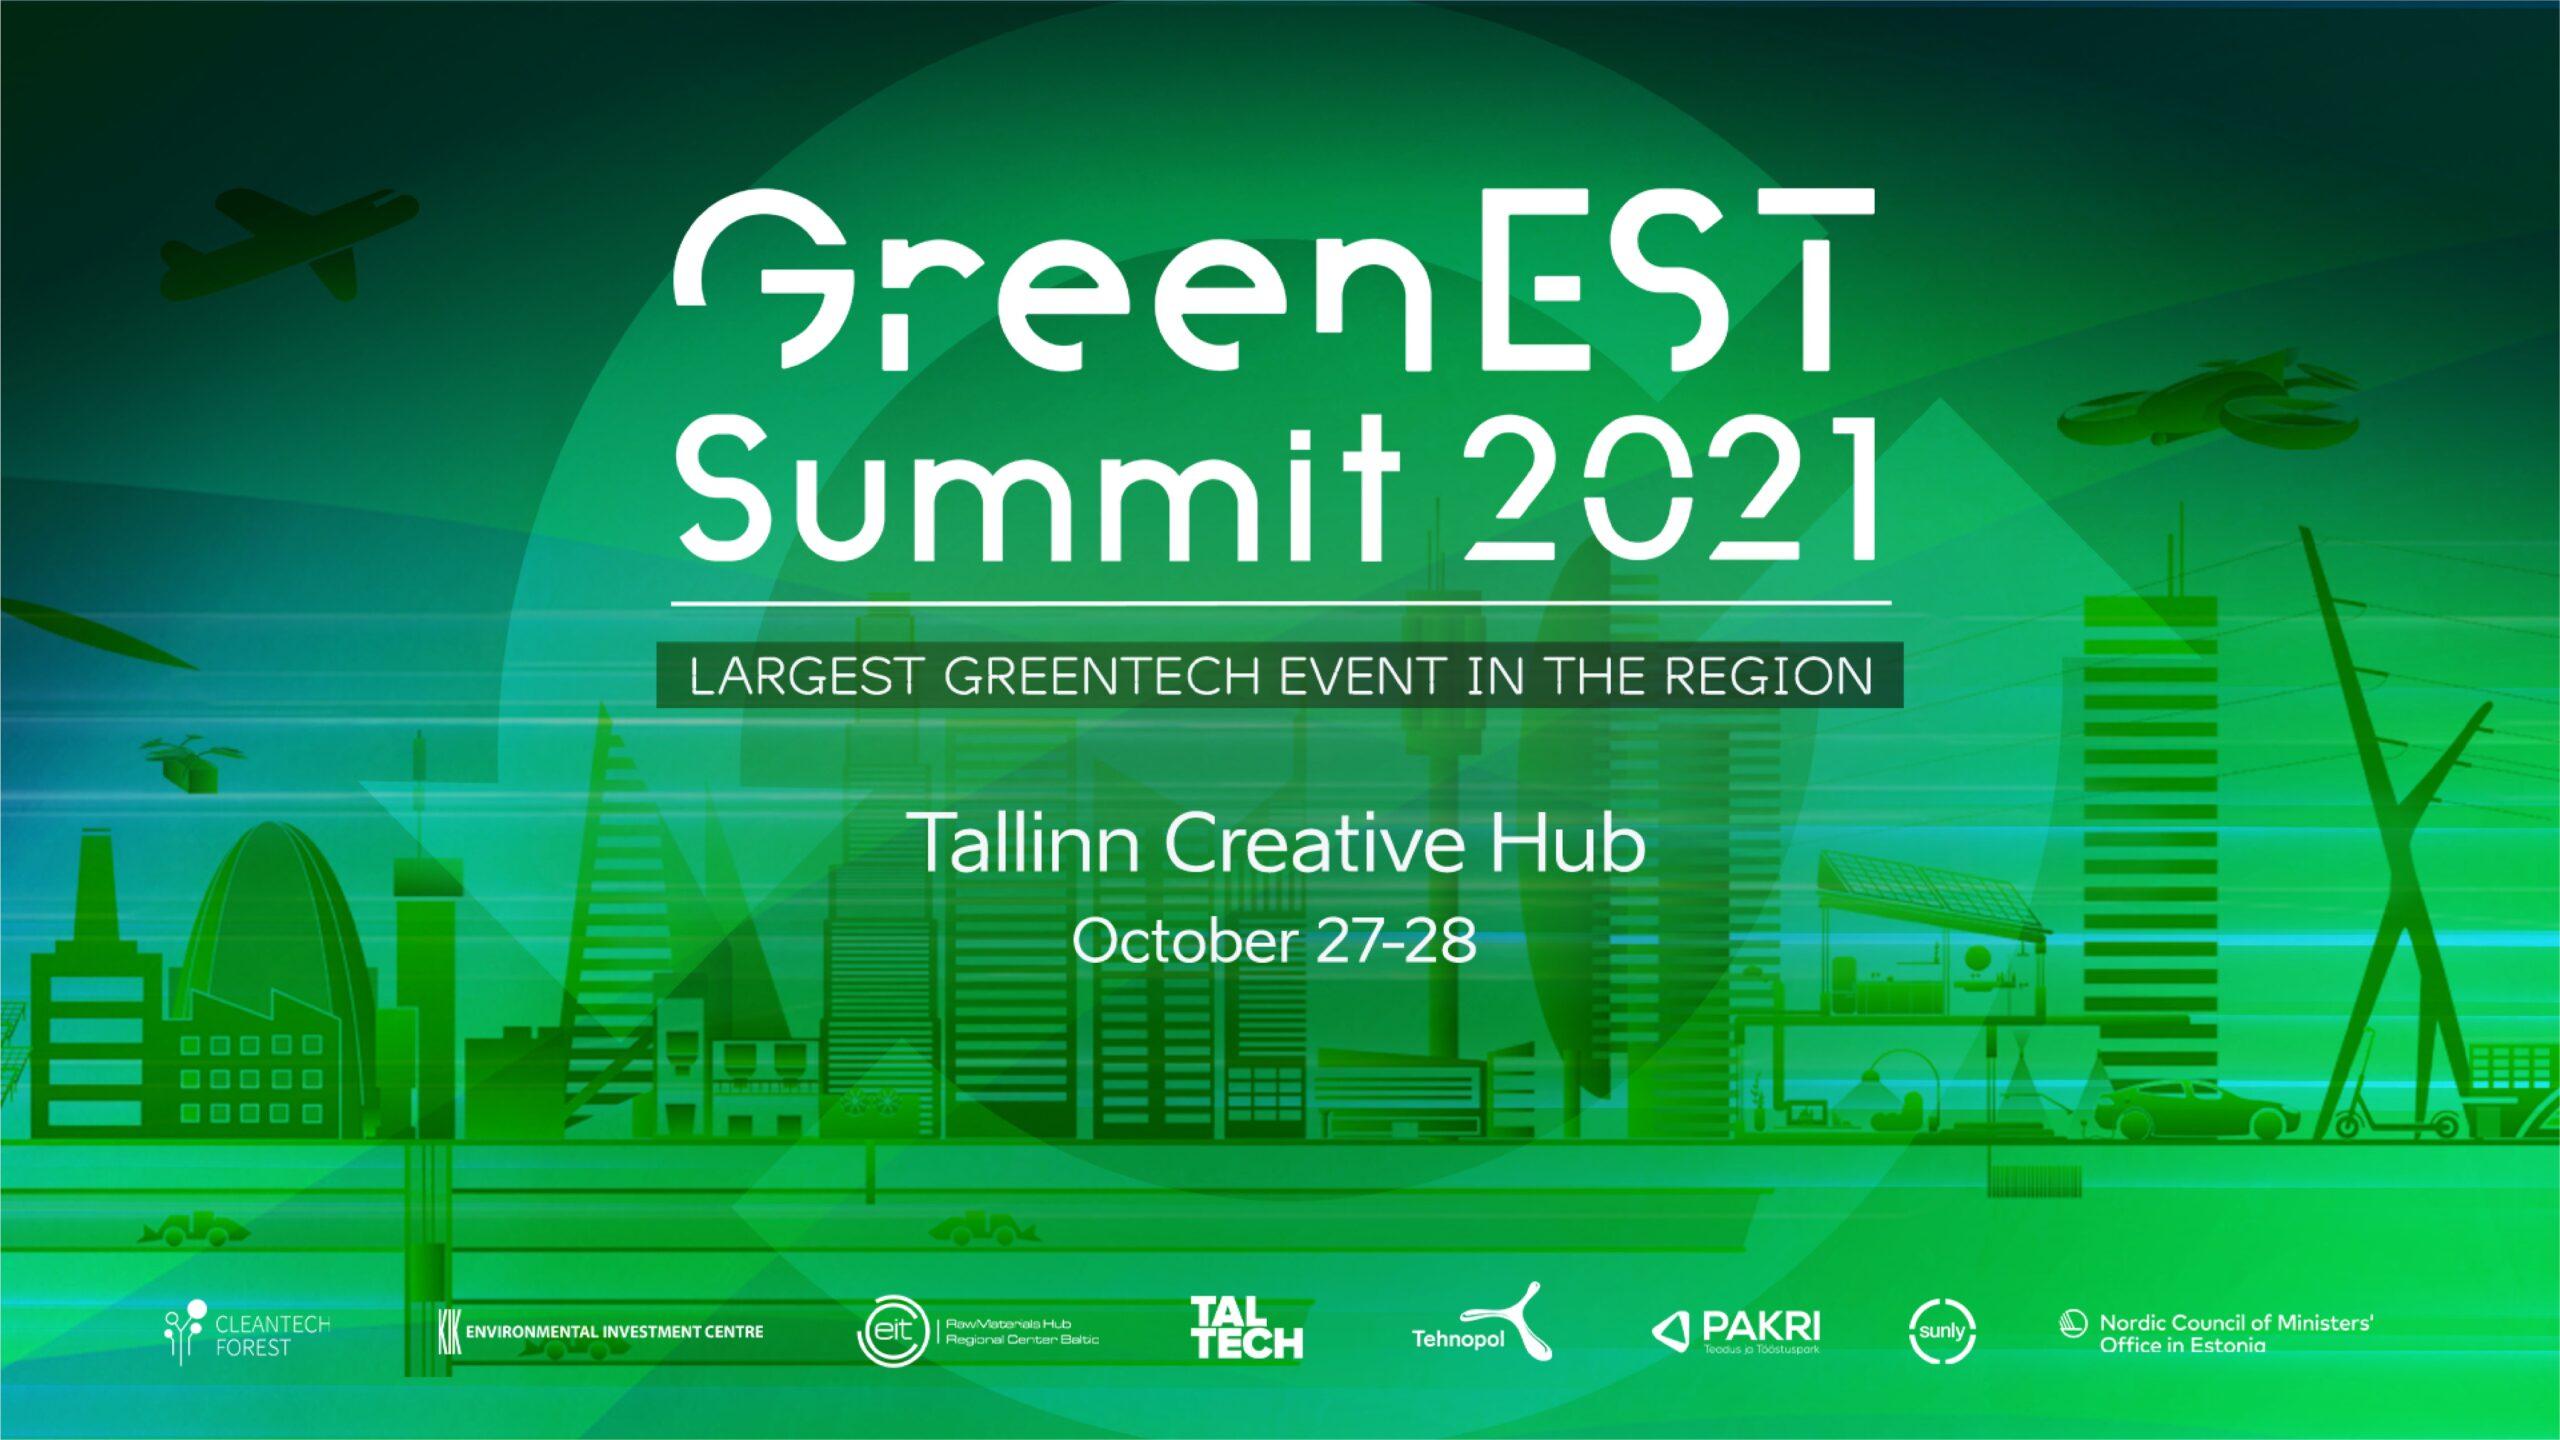 13816Green EST Summit 2021